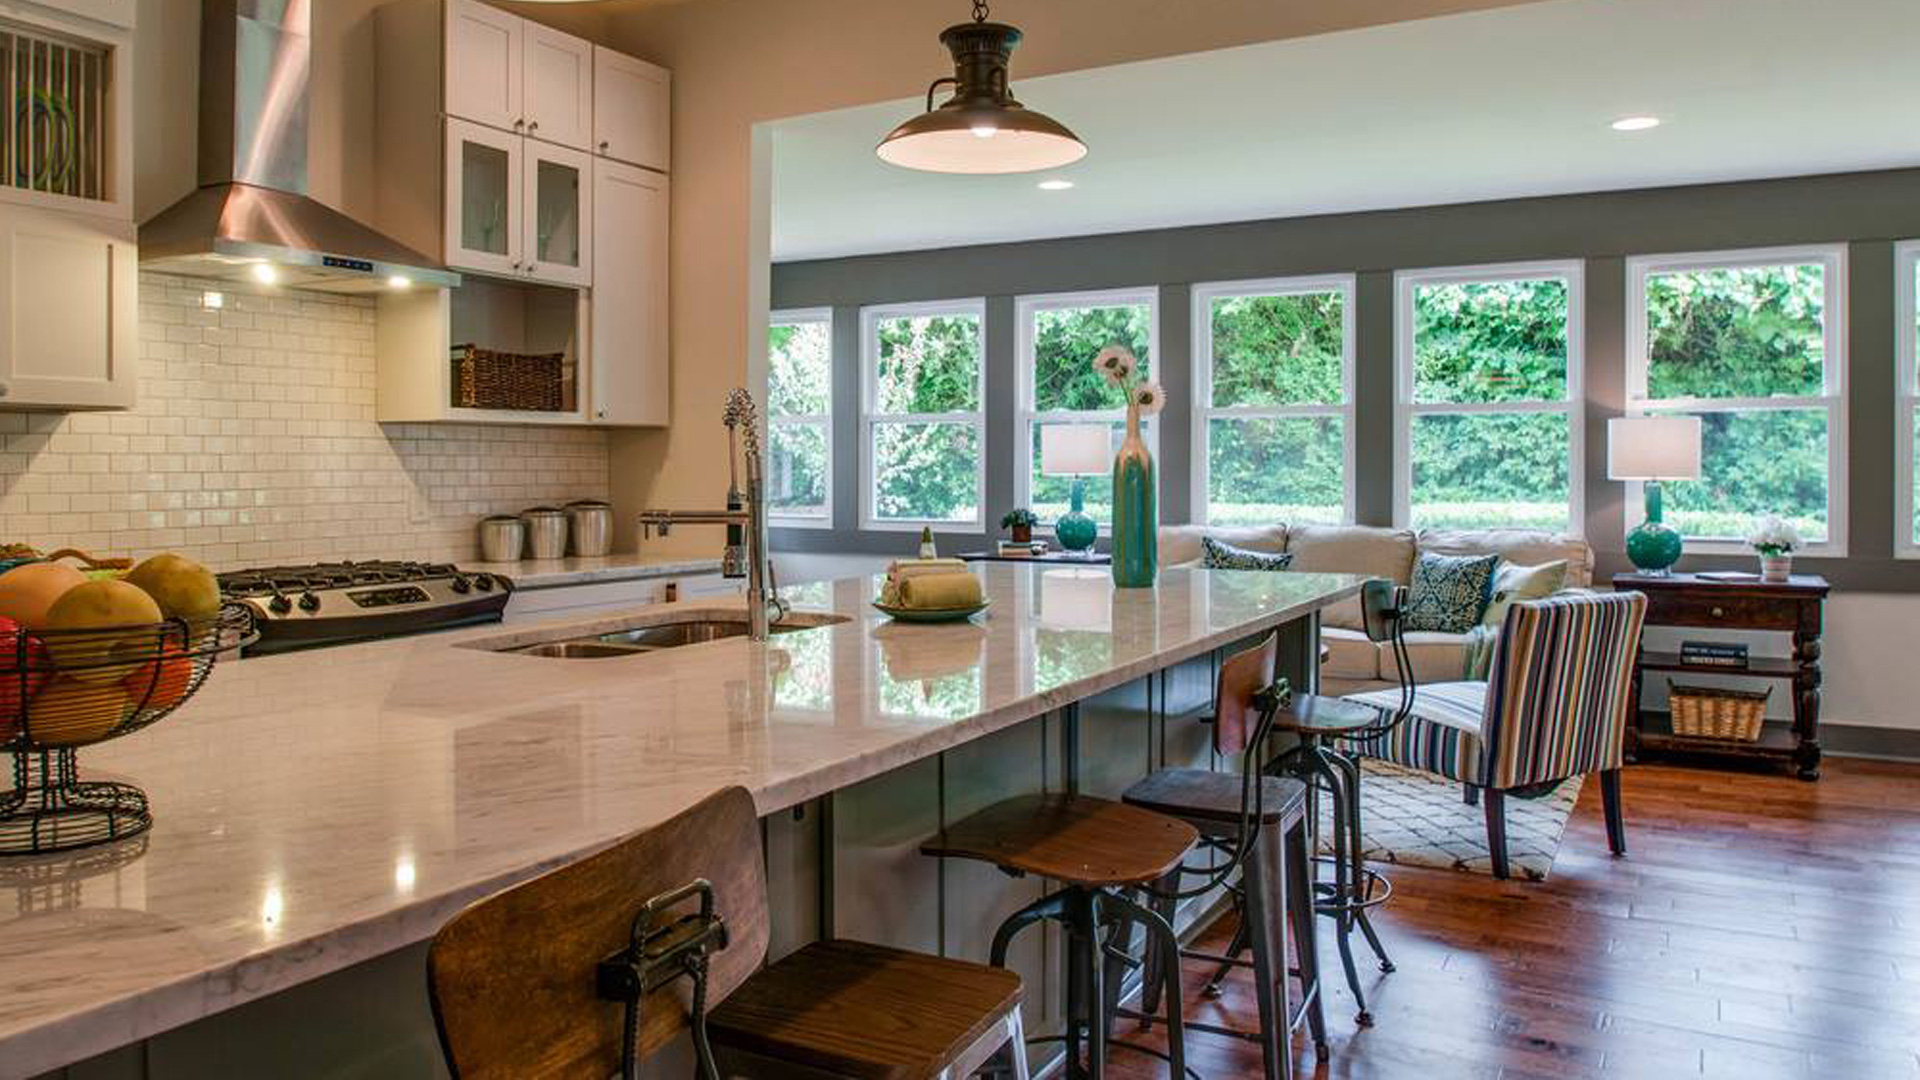 Home Remodeling Decks Patios Chattanooga Ooltewah TN